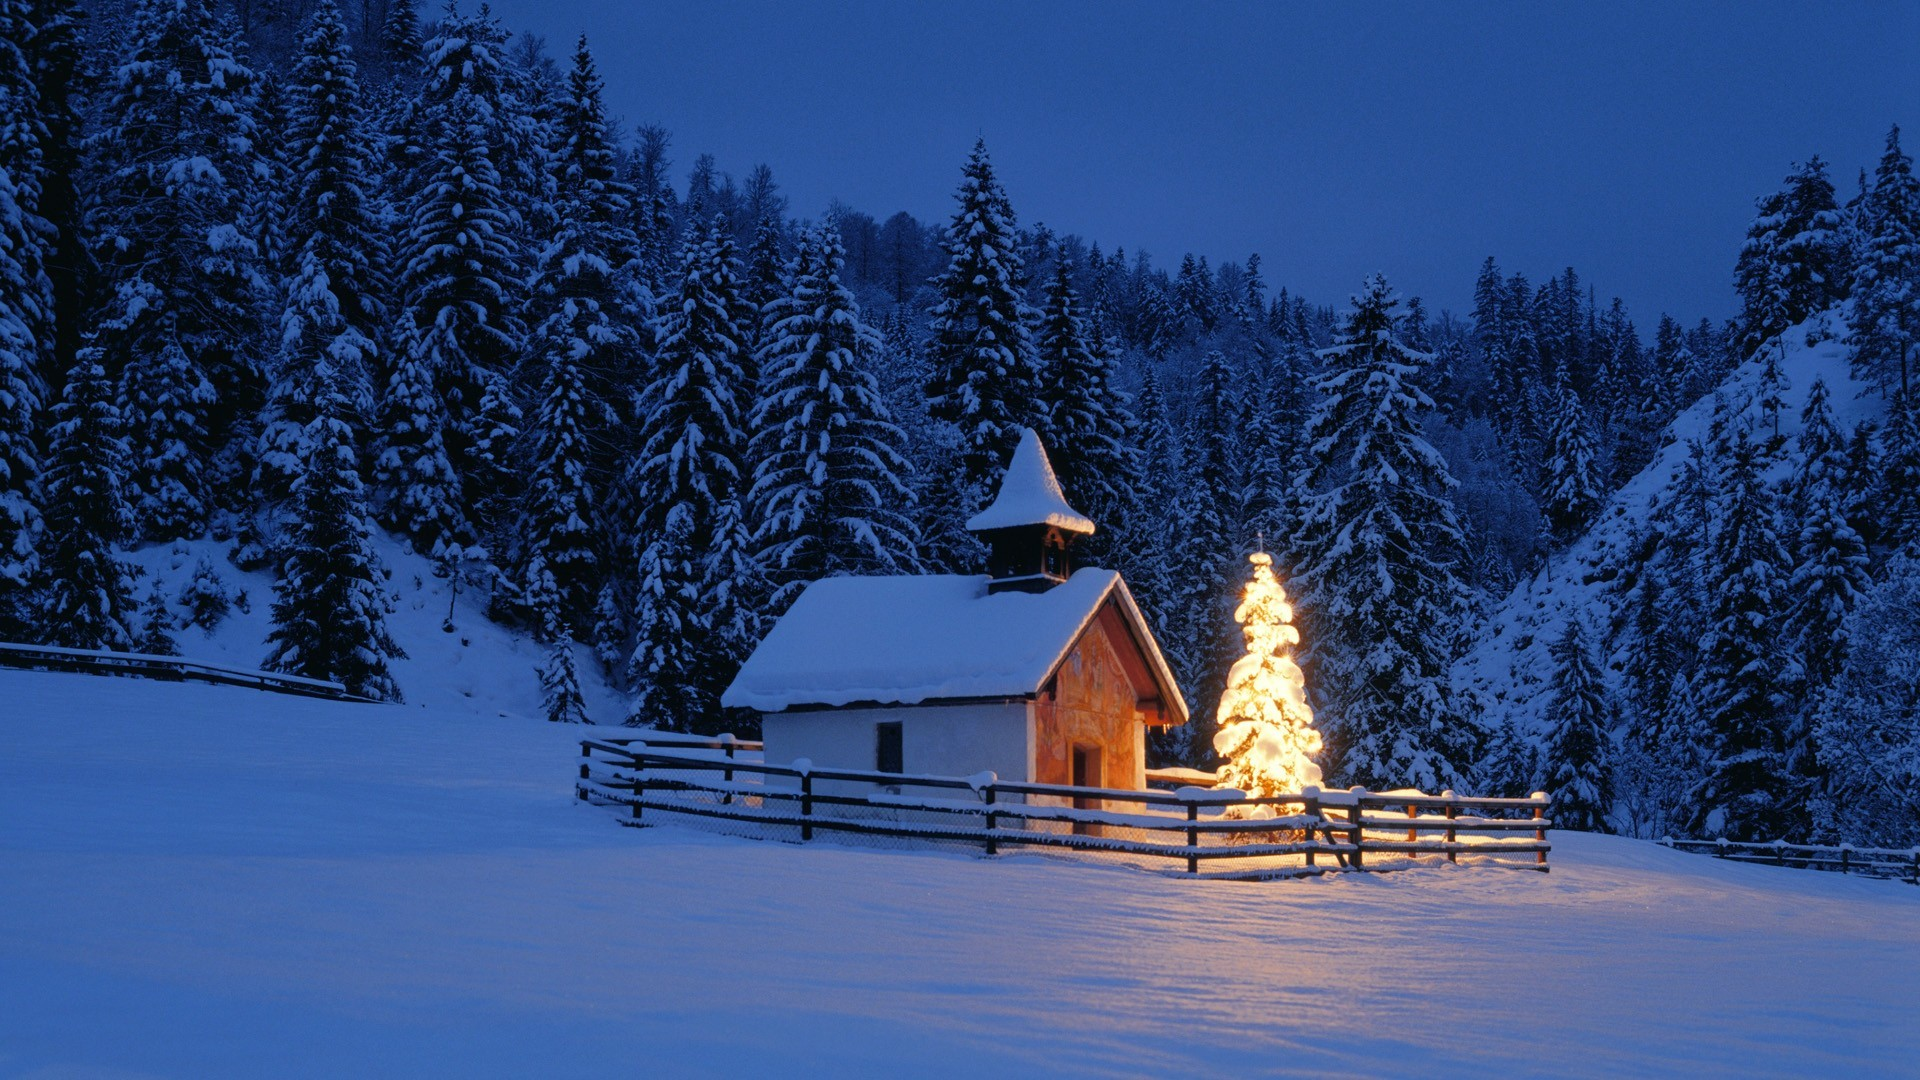 wallpaper-winter-iphone-photo-download-free-03 Winter wallpapers …